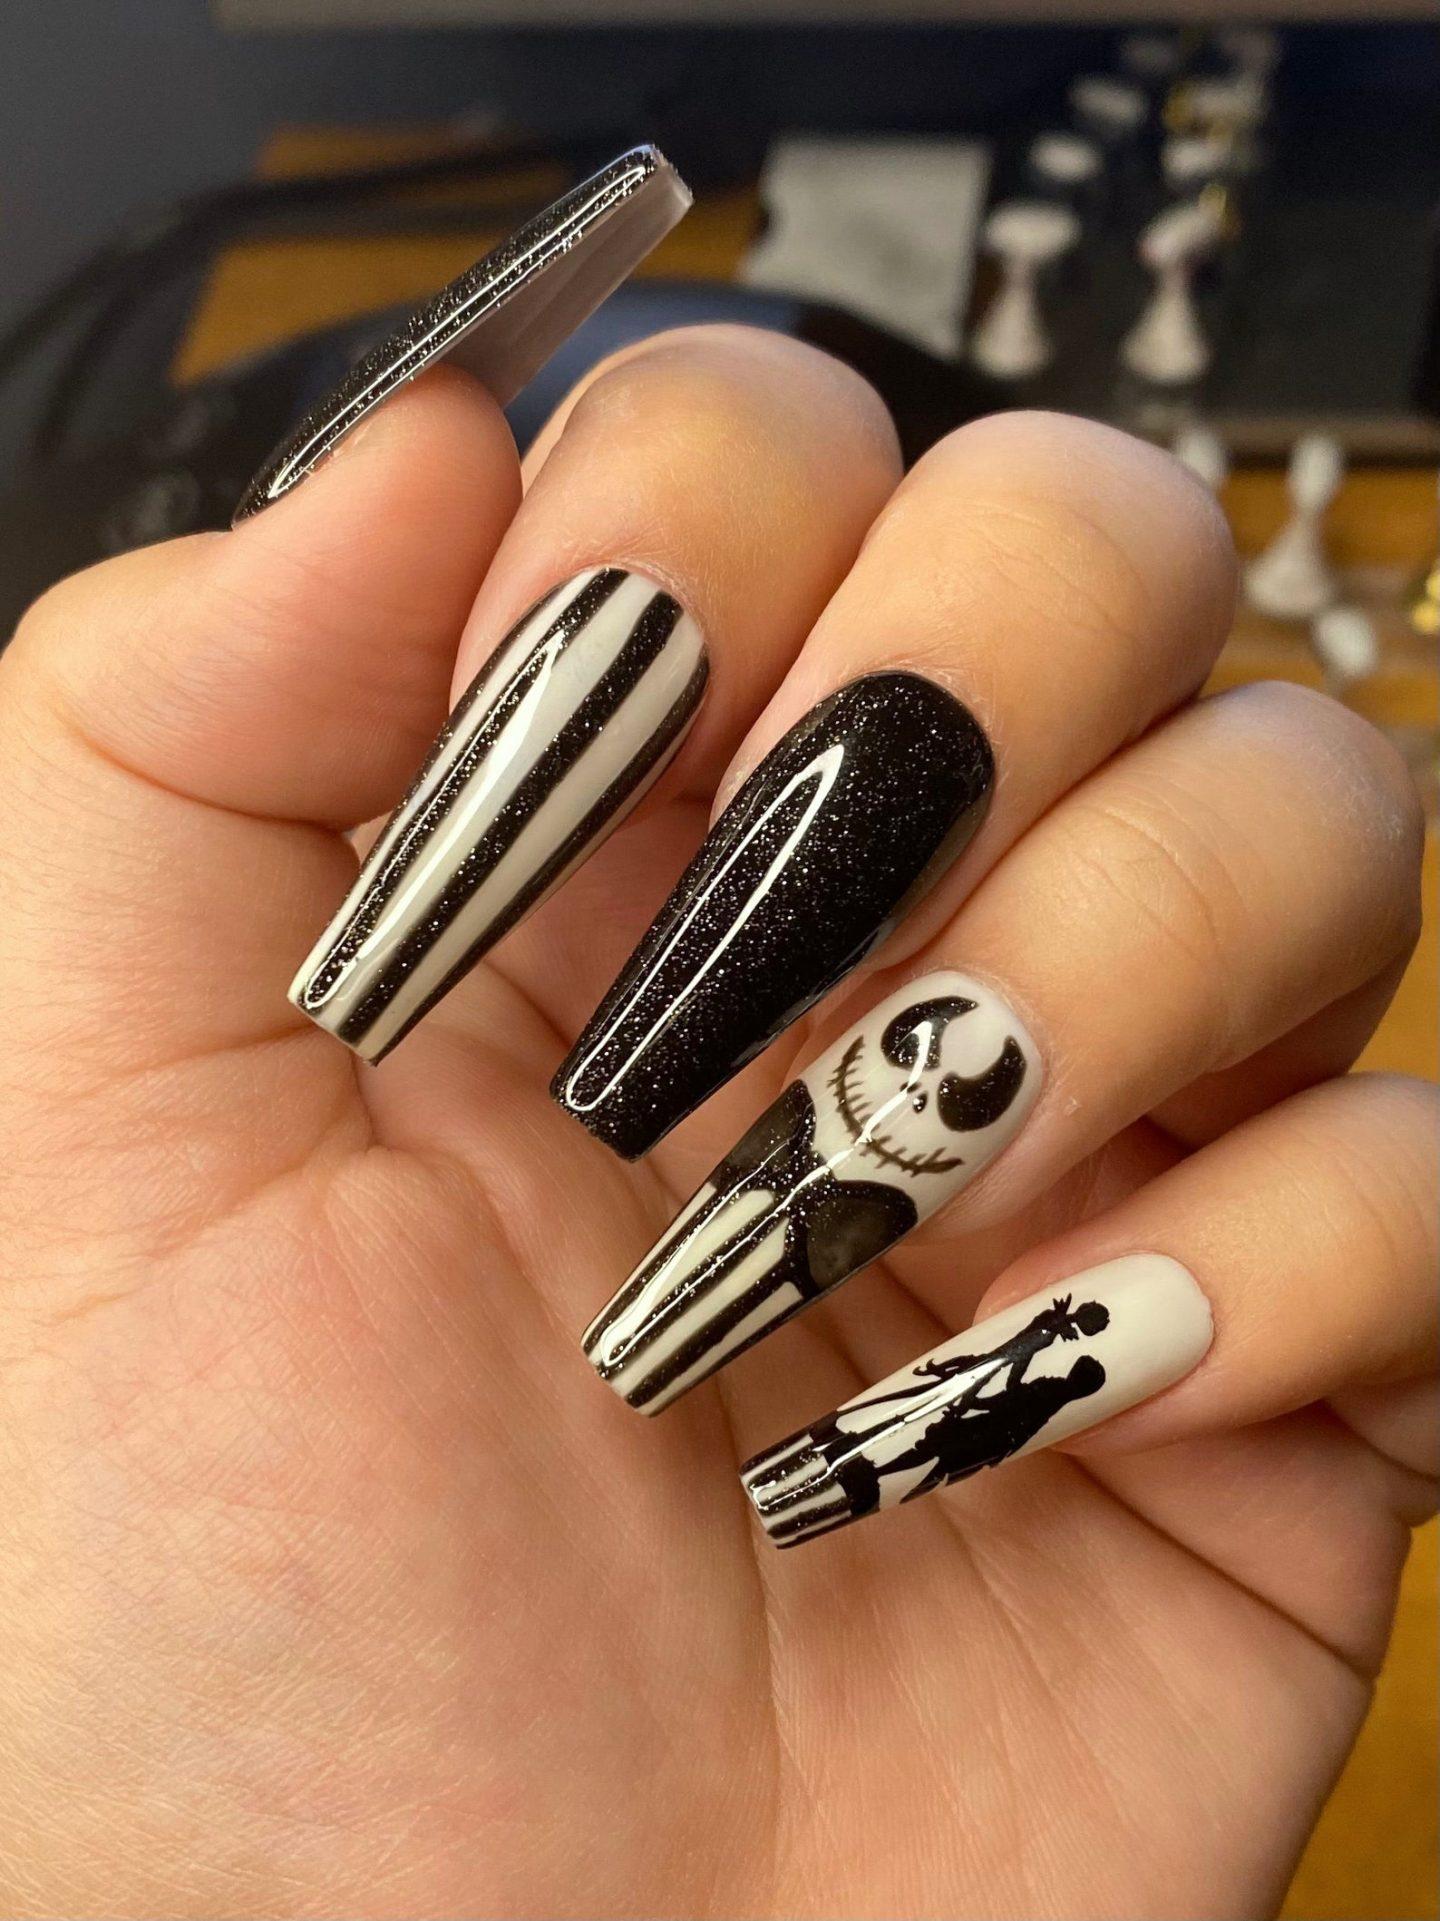 Black and white Jack Skellington Halloween nails